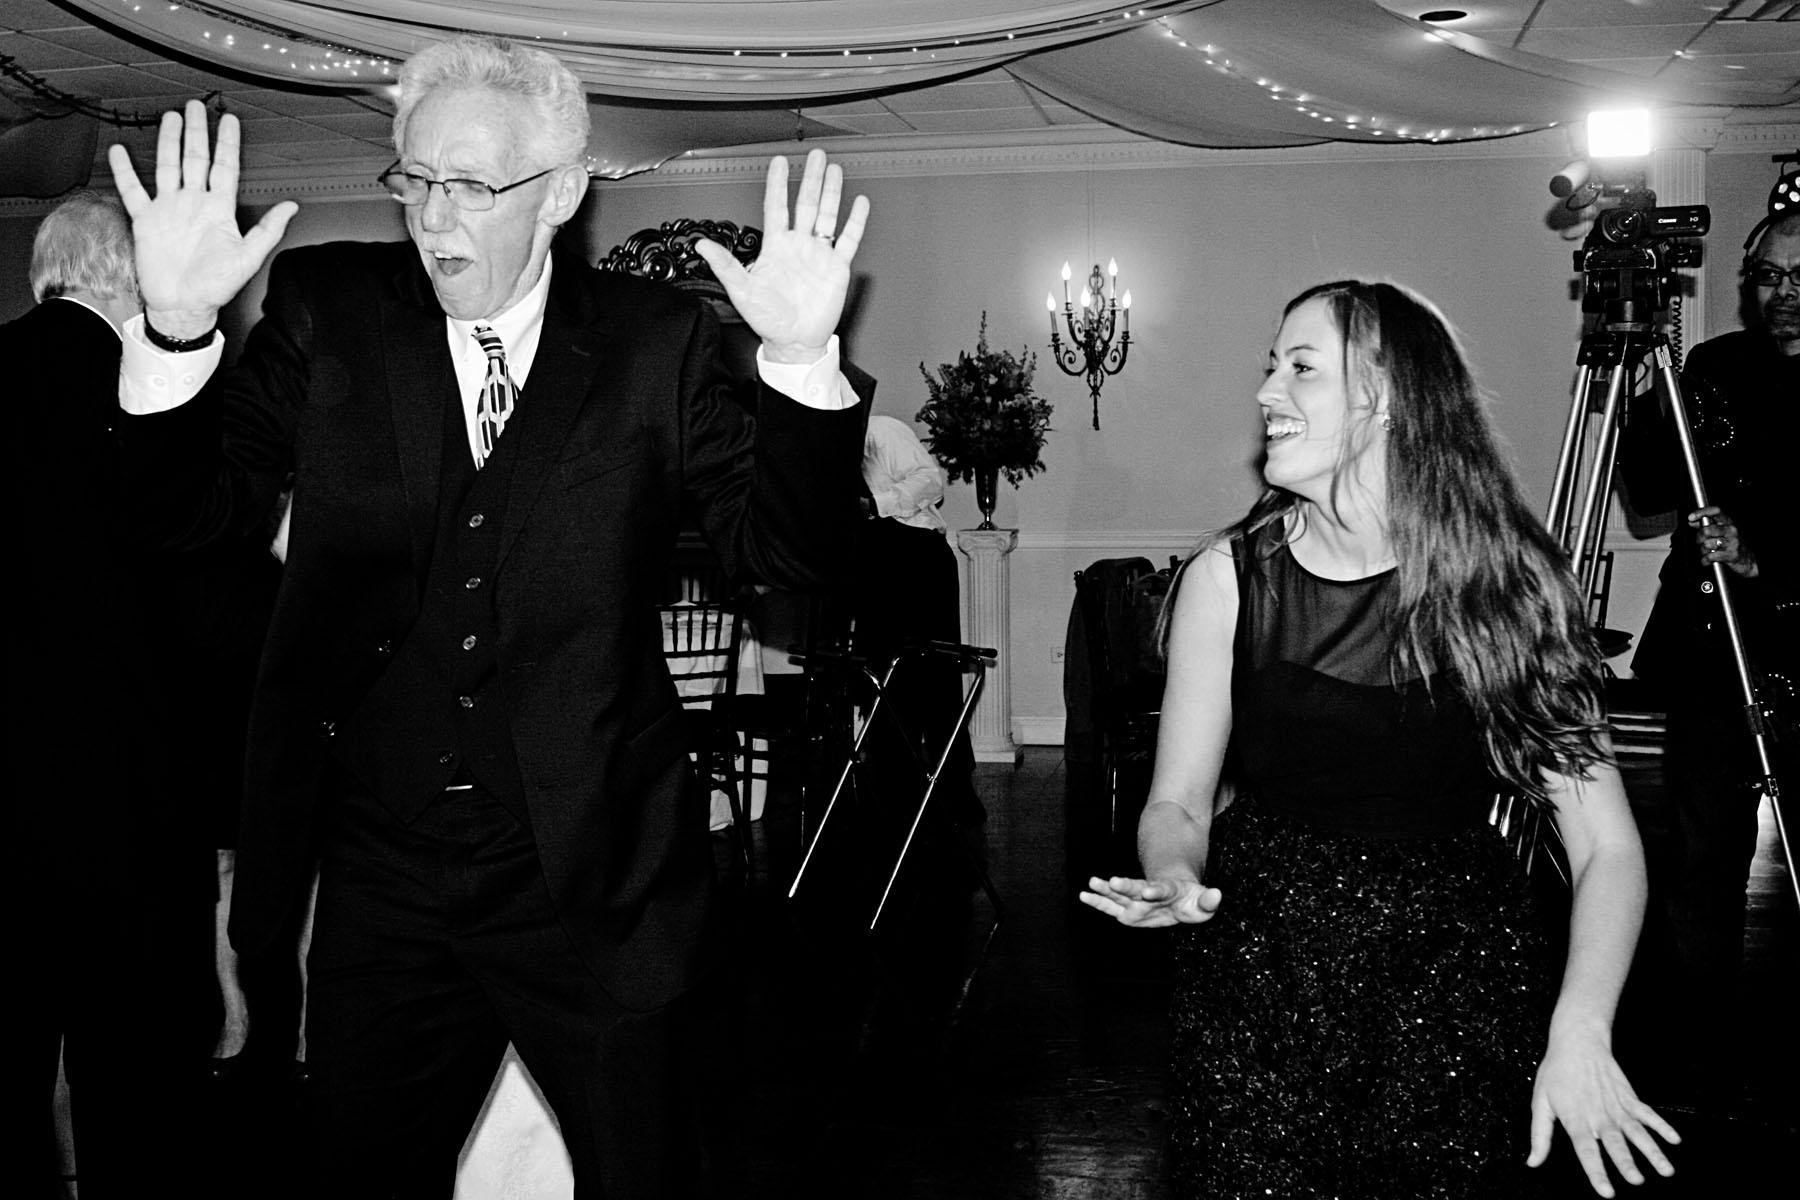 lenny_amy_dancing_bw_1.jpg